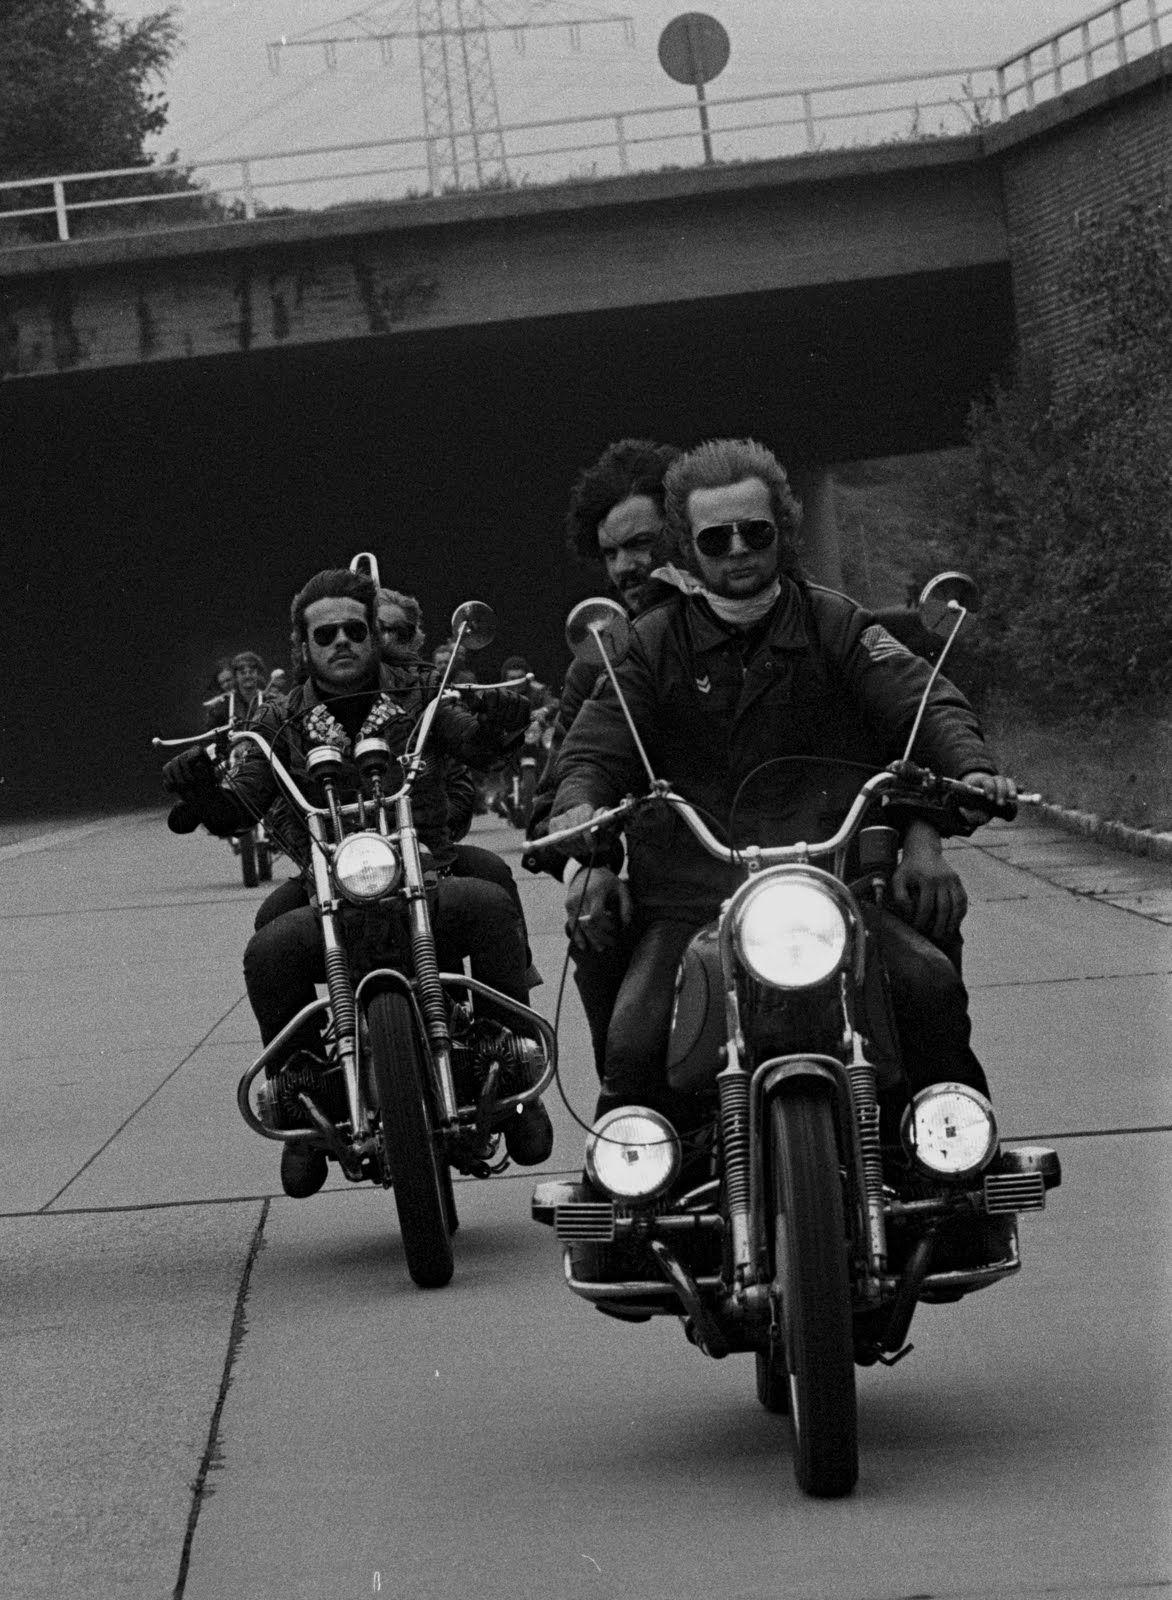 50s rockers subcultures Pinterest Rockers, Kustom